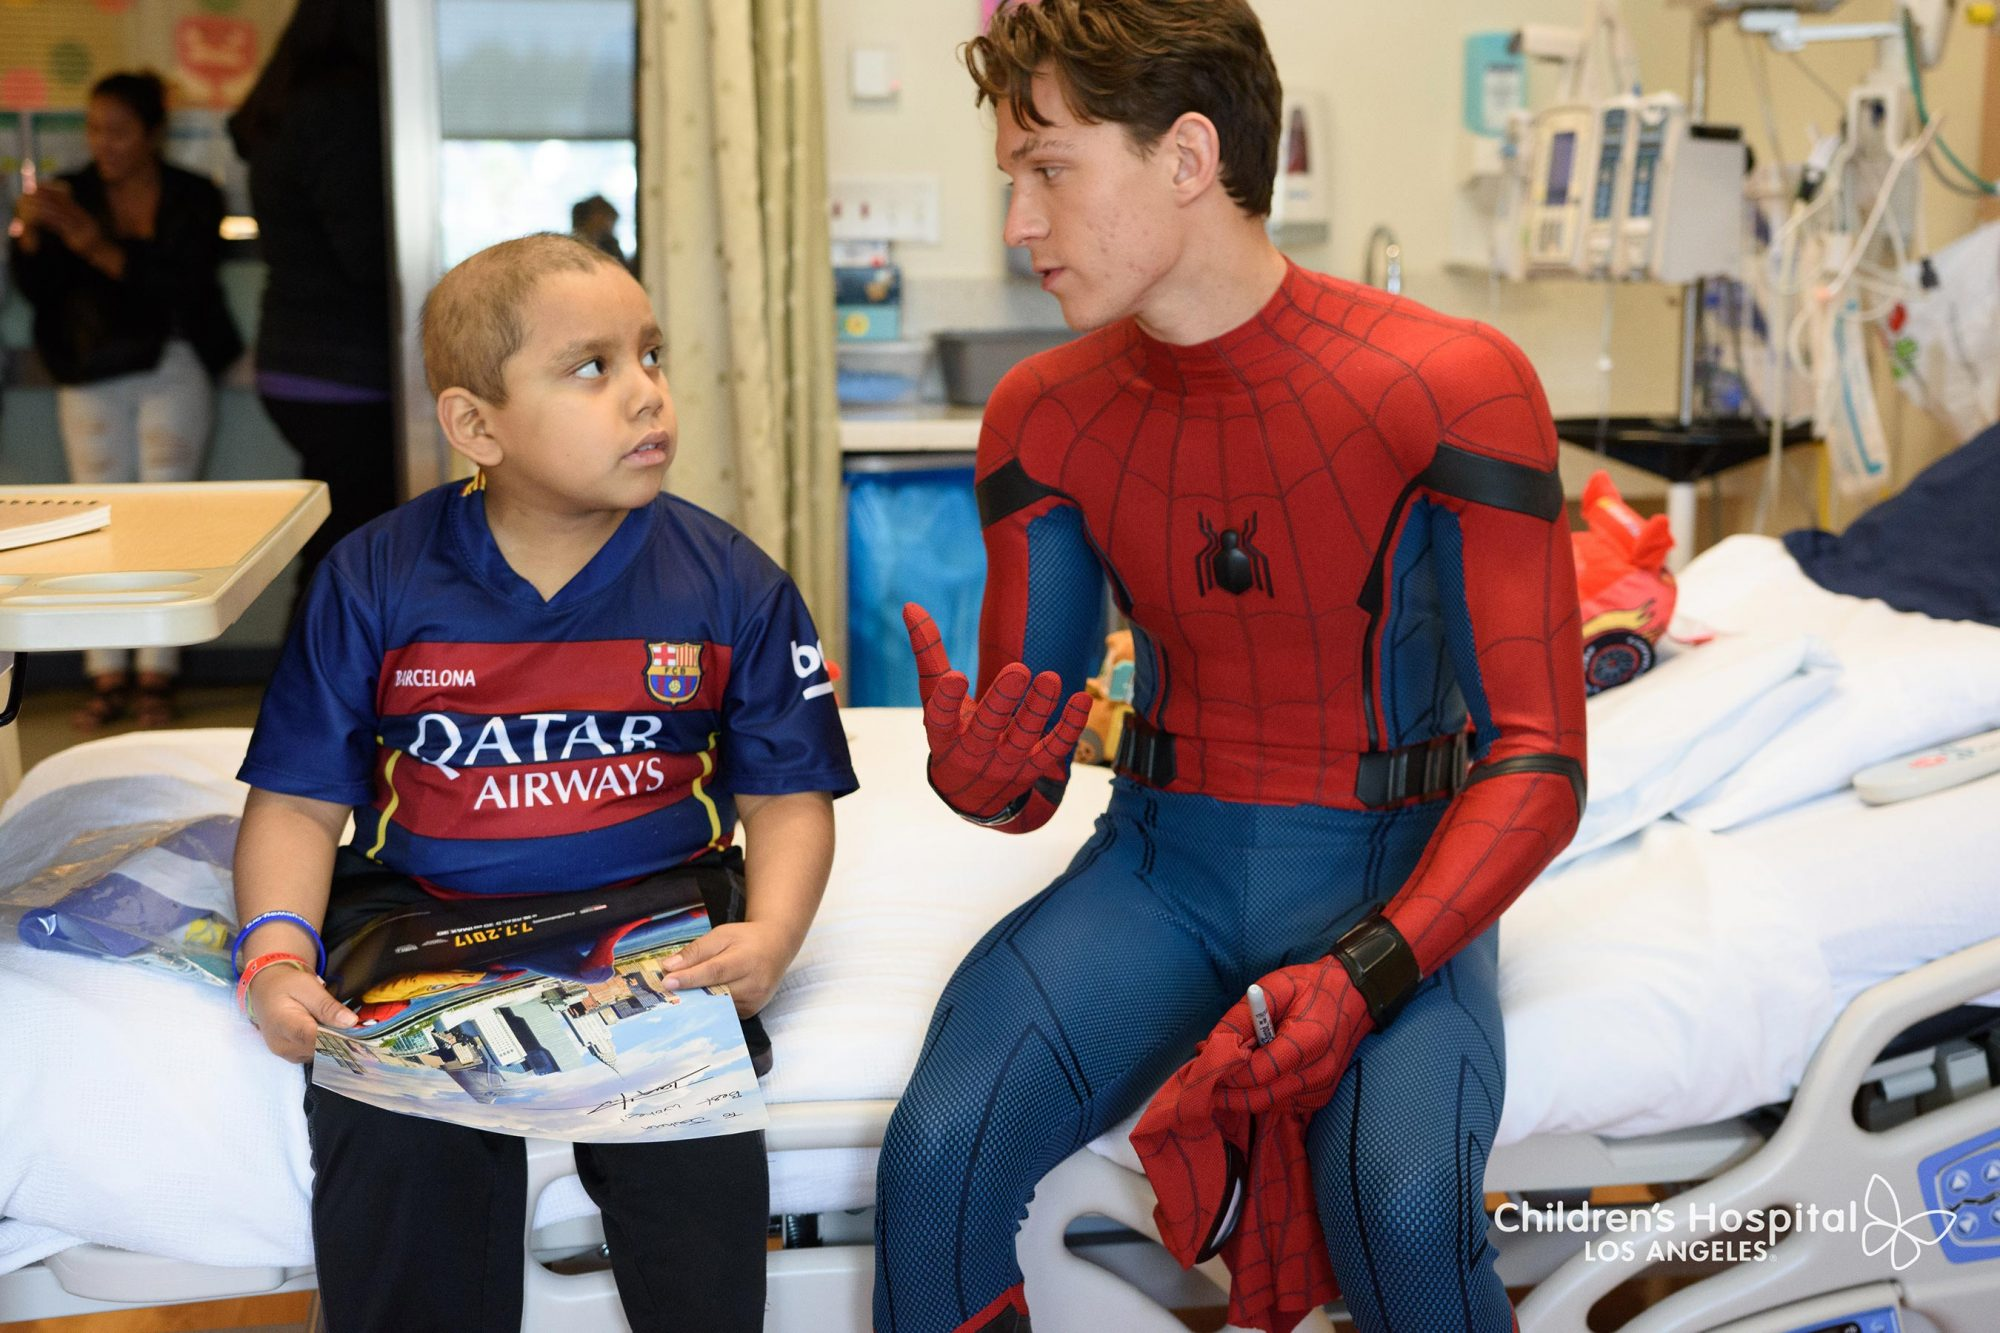 TomHolland-Spiderman-2017-5-15-wm-0039